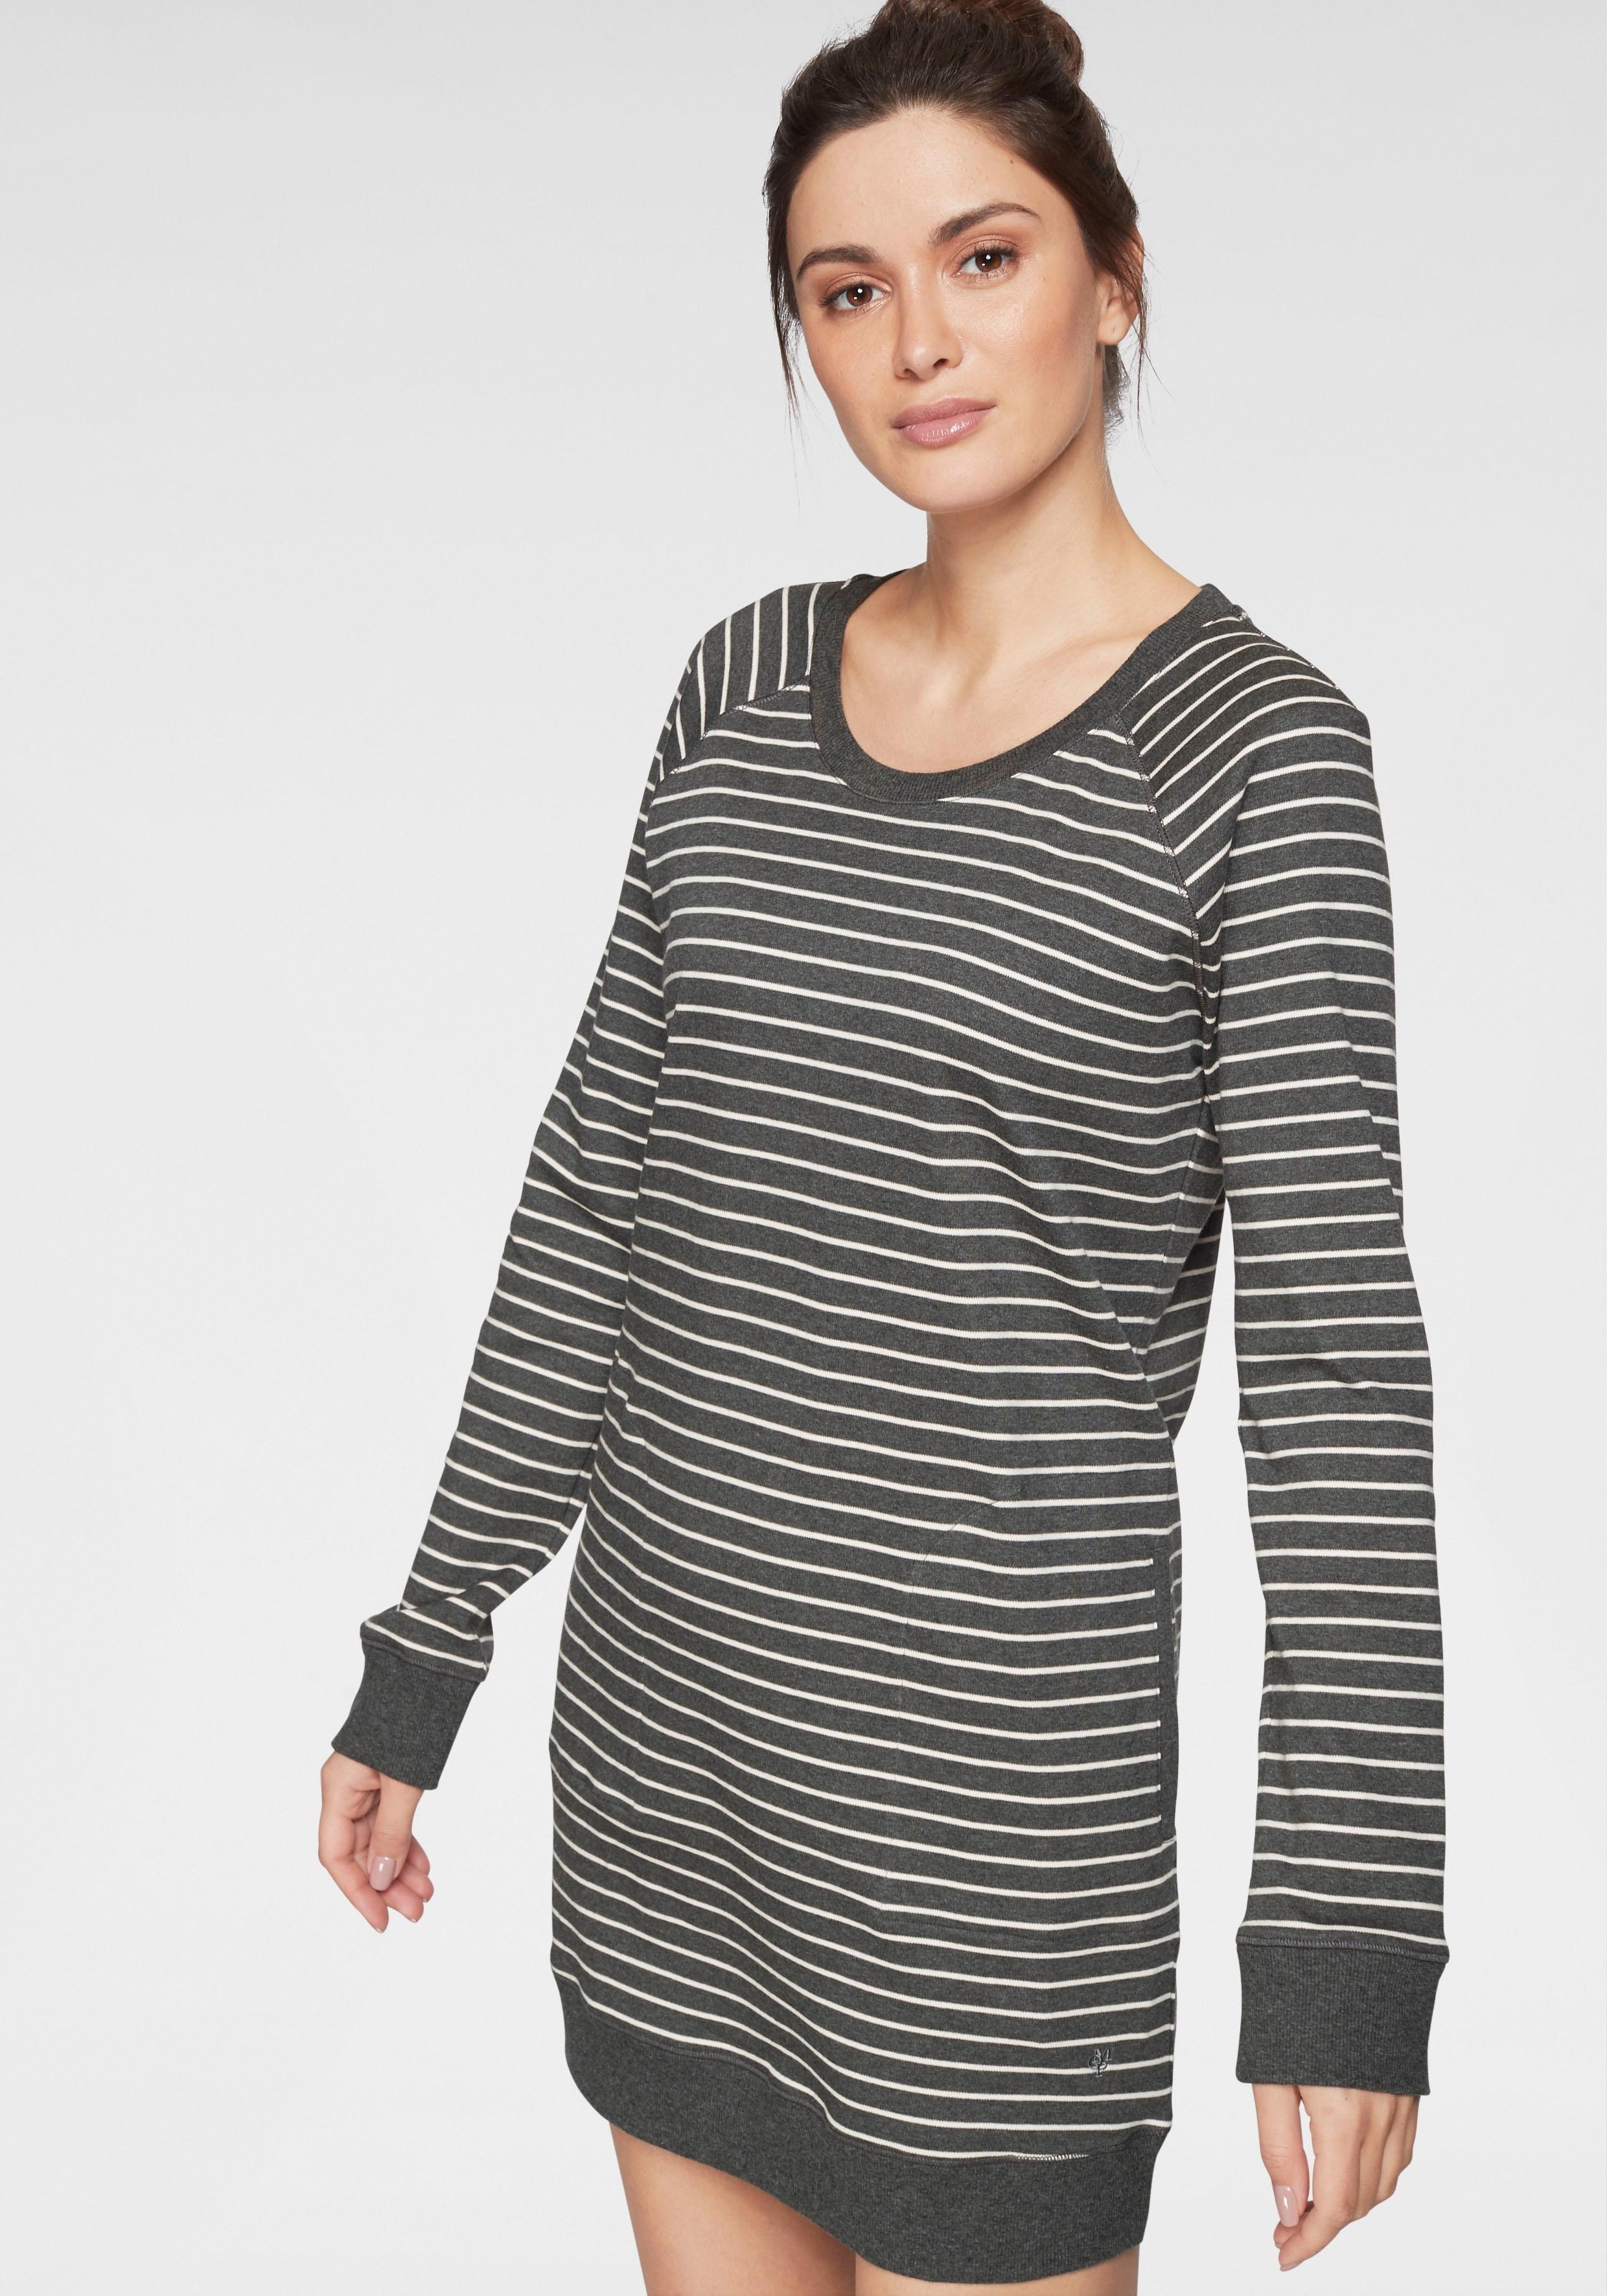 Marc O'Polo Nachthemd met streepdessin met steekzakken bij Lascana online kopen